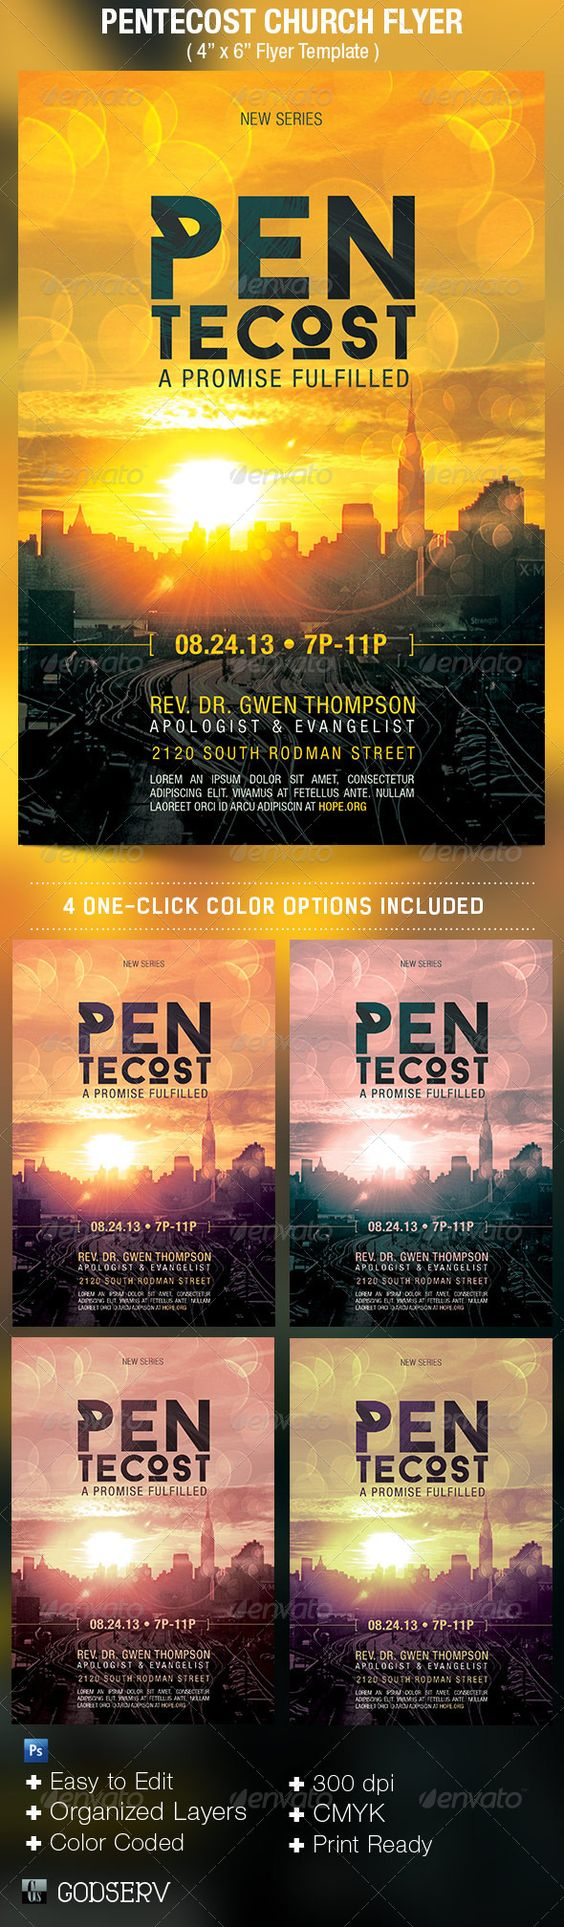 pentecost gospel coalition